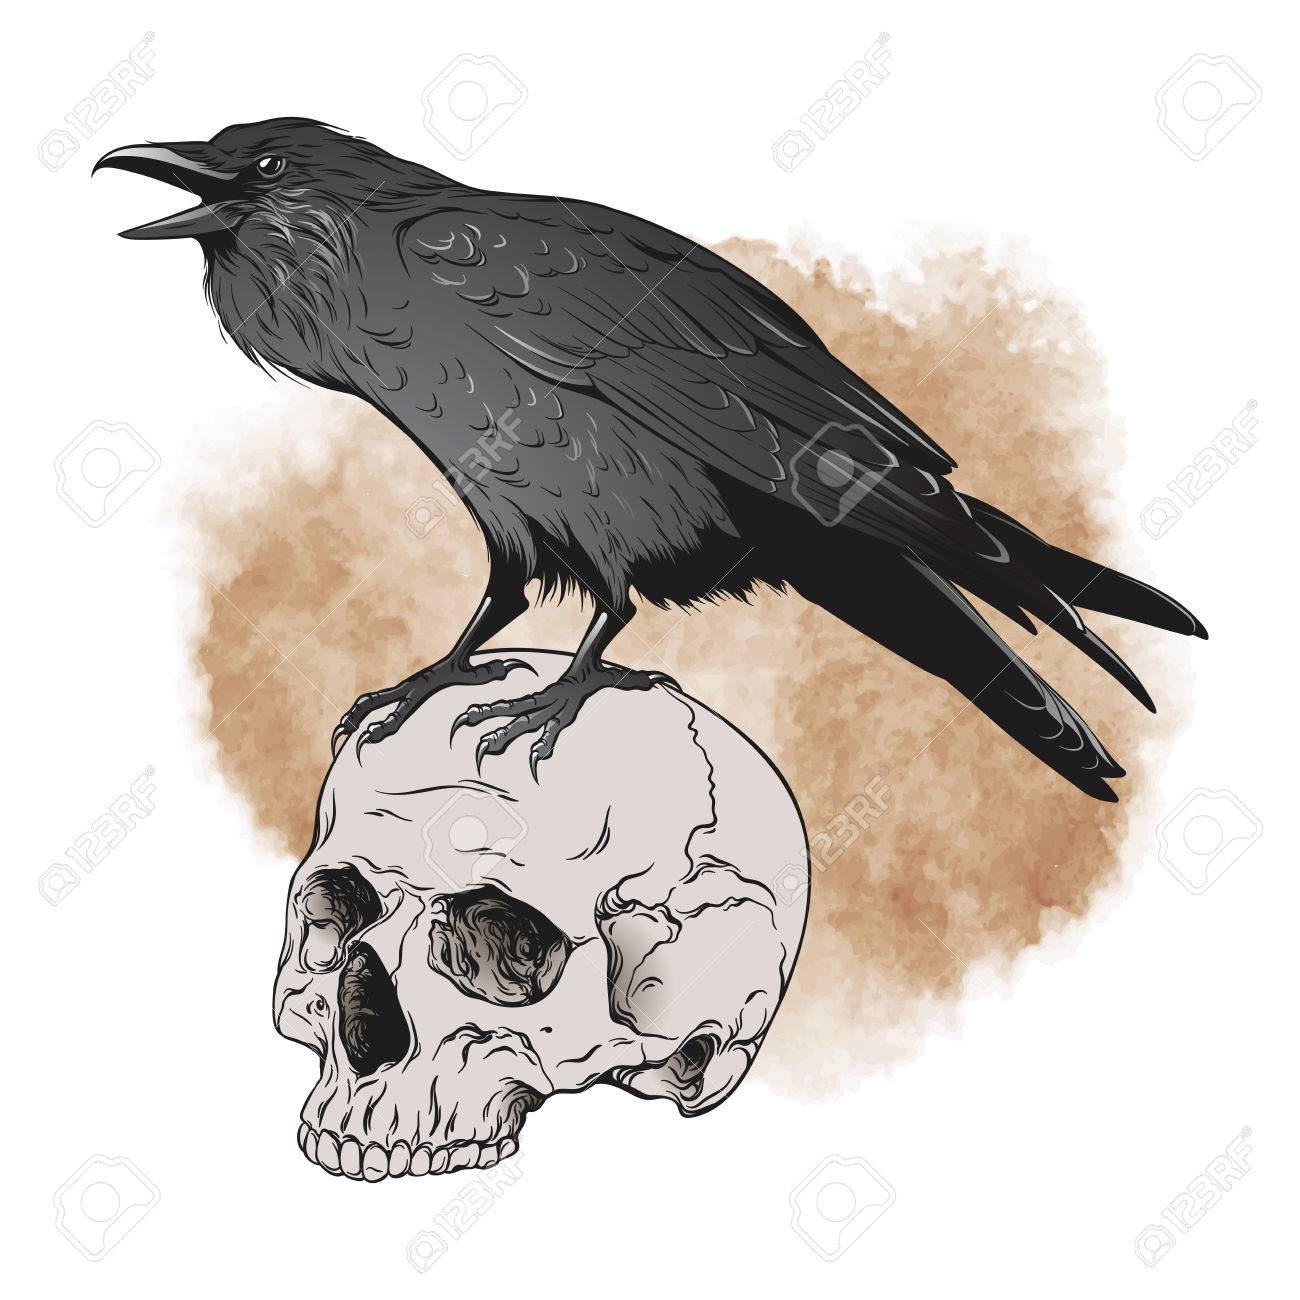 Raven and skull on sepia background vector illustration. - 78496395